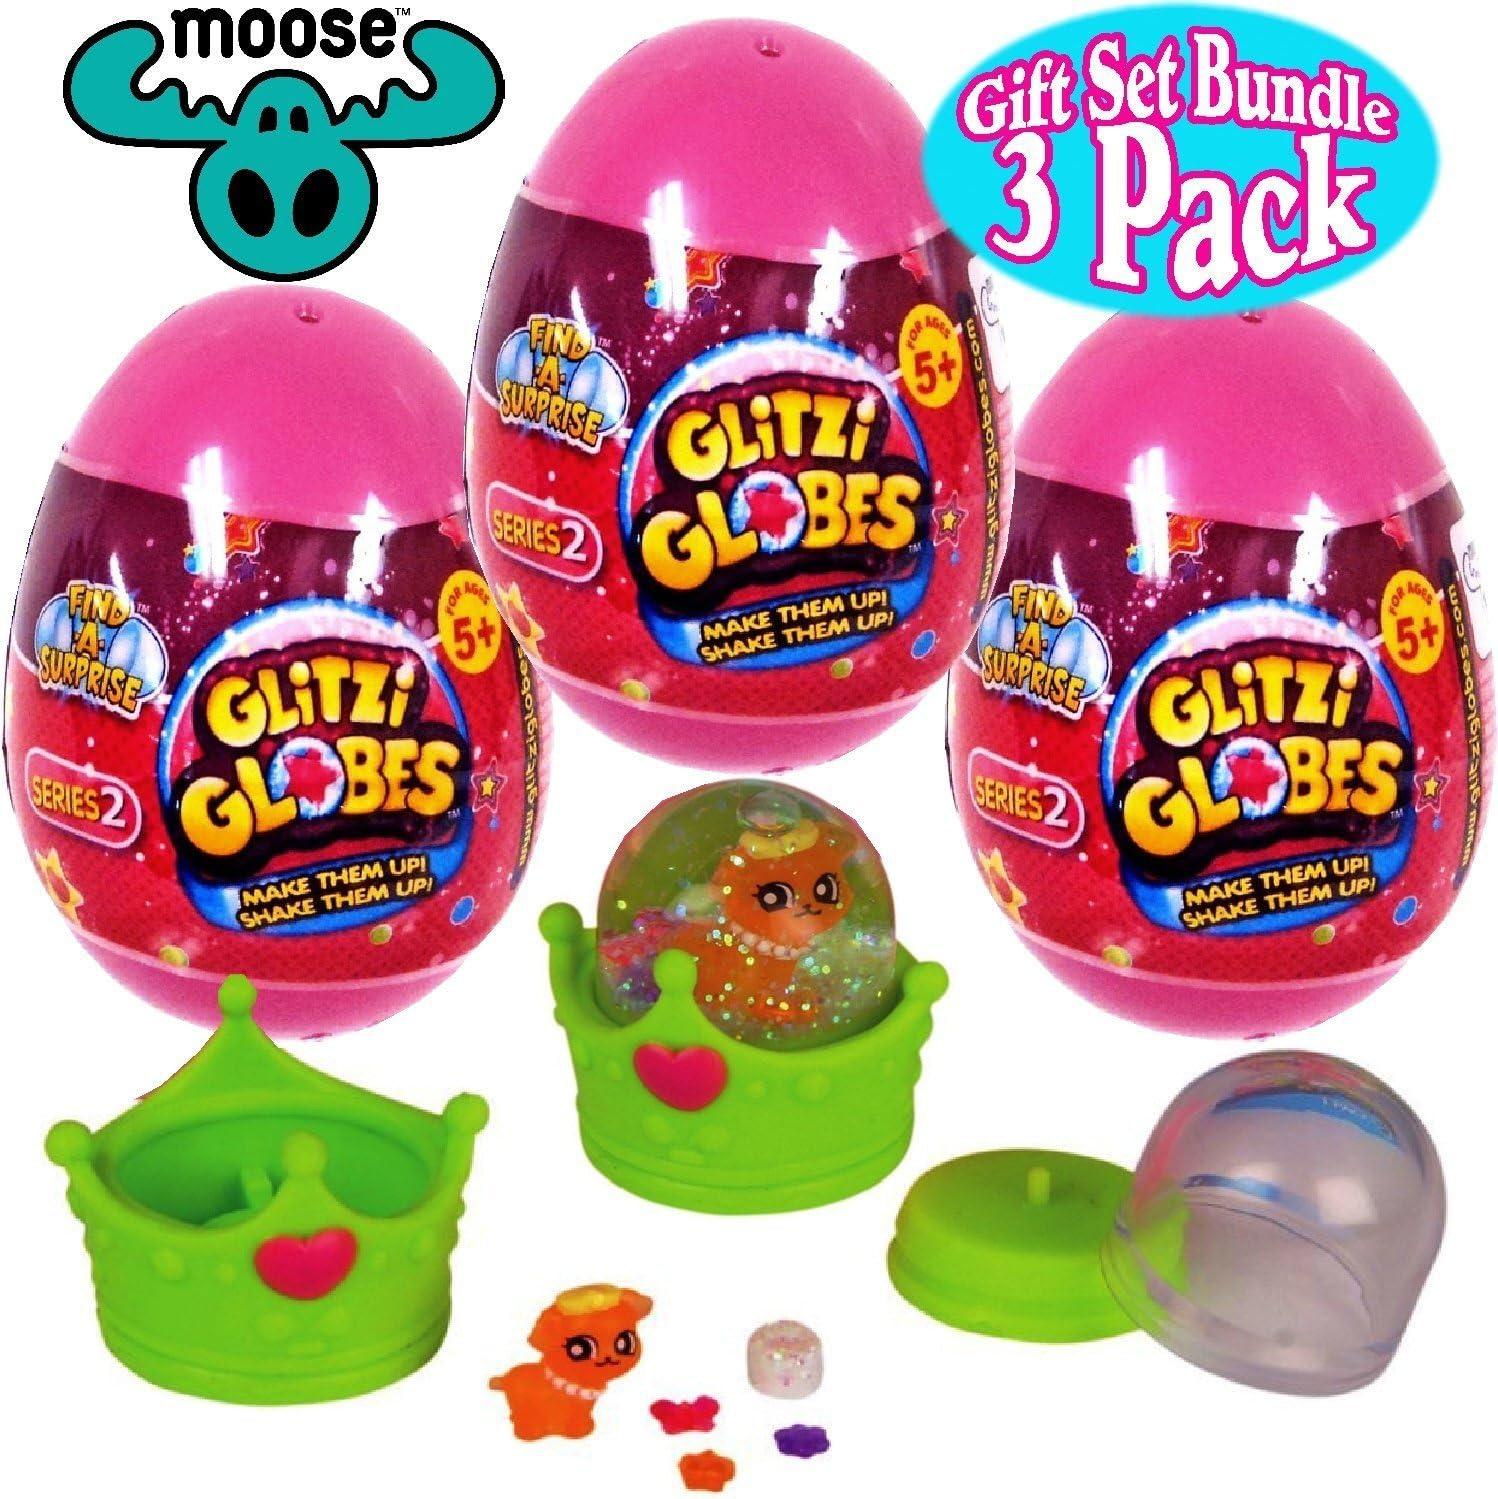 Amazon.com: Glitzi Globes